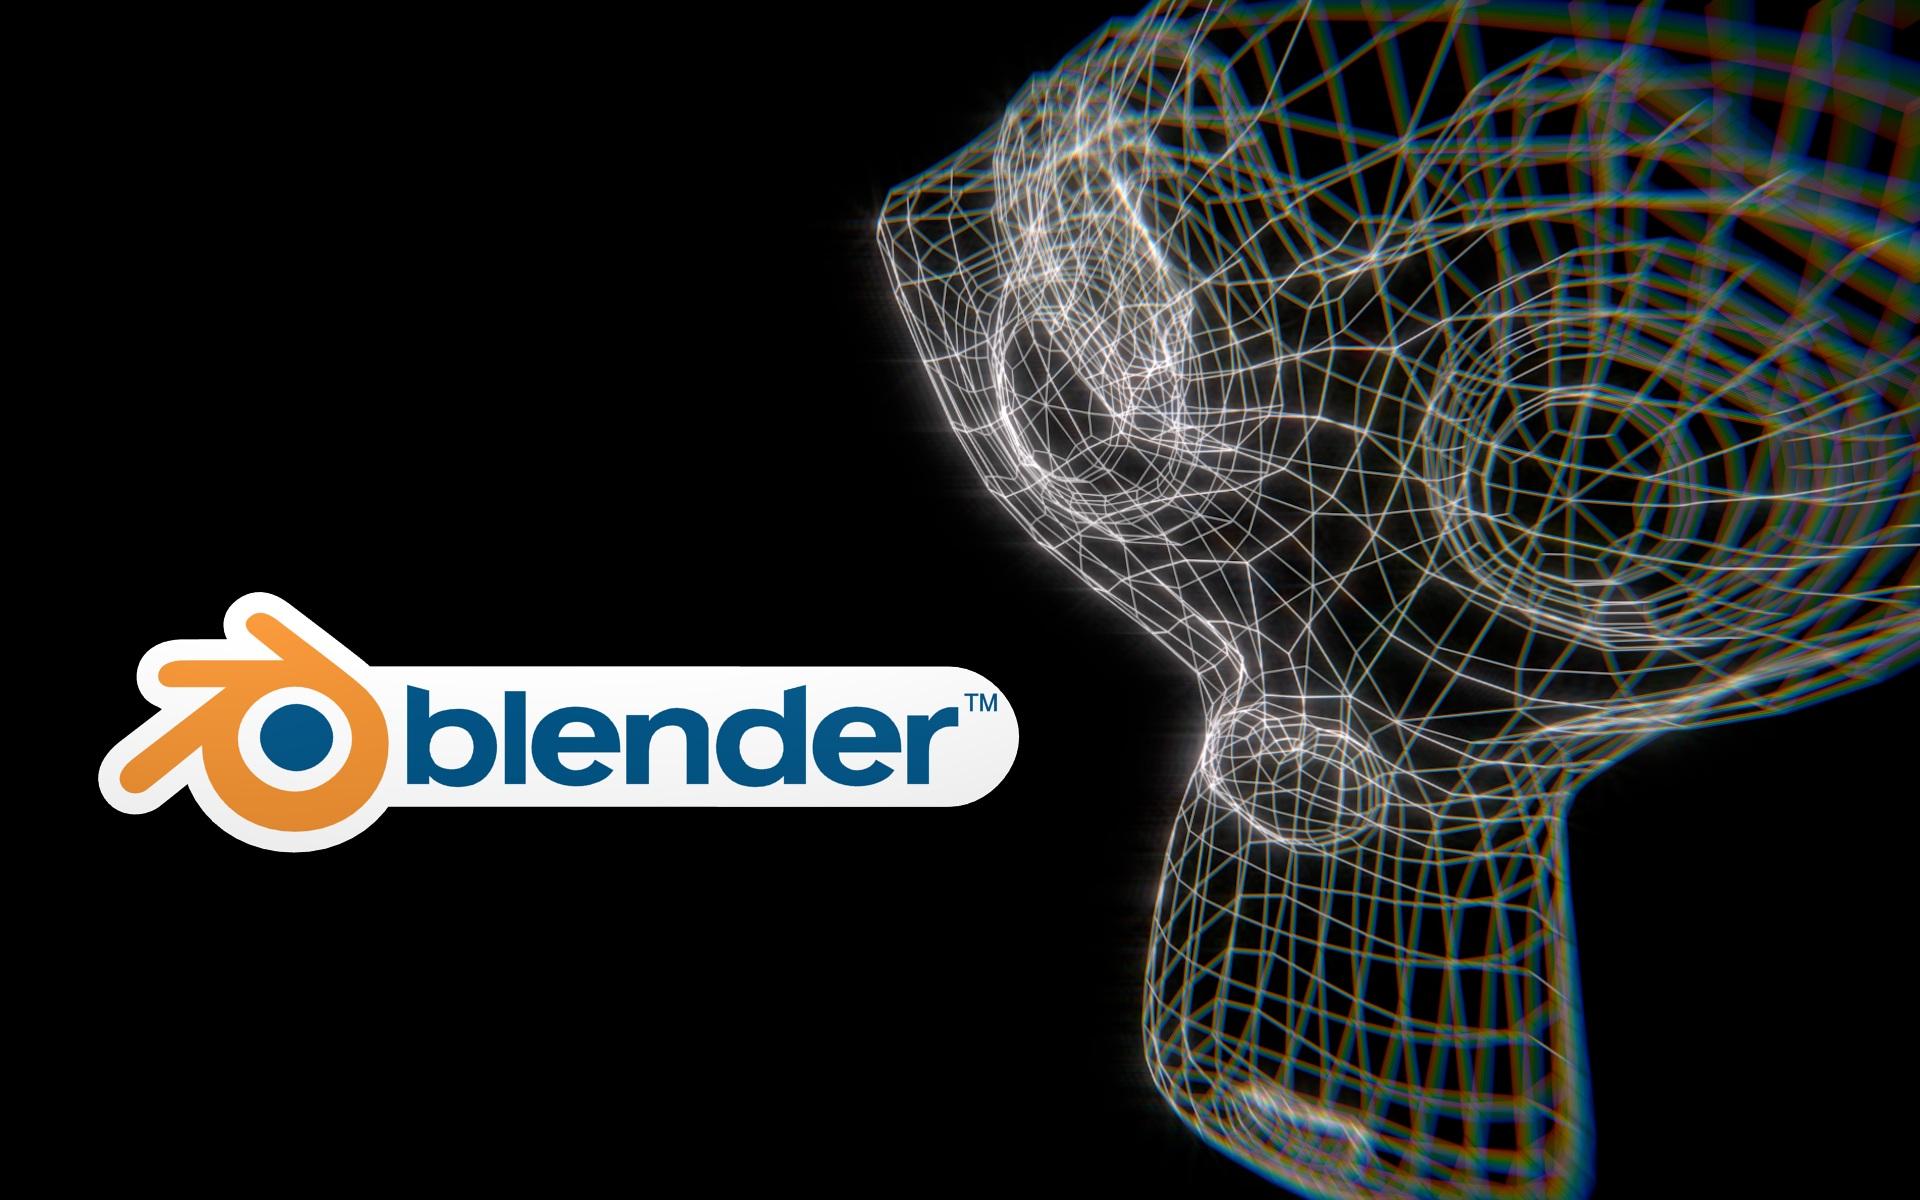 Blender Logo Wallpaper | www.pixshark.com - Images